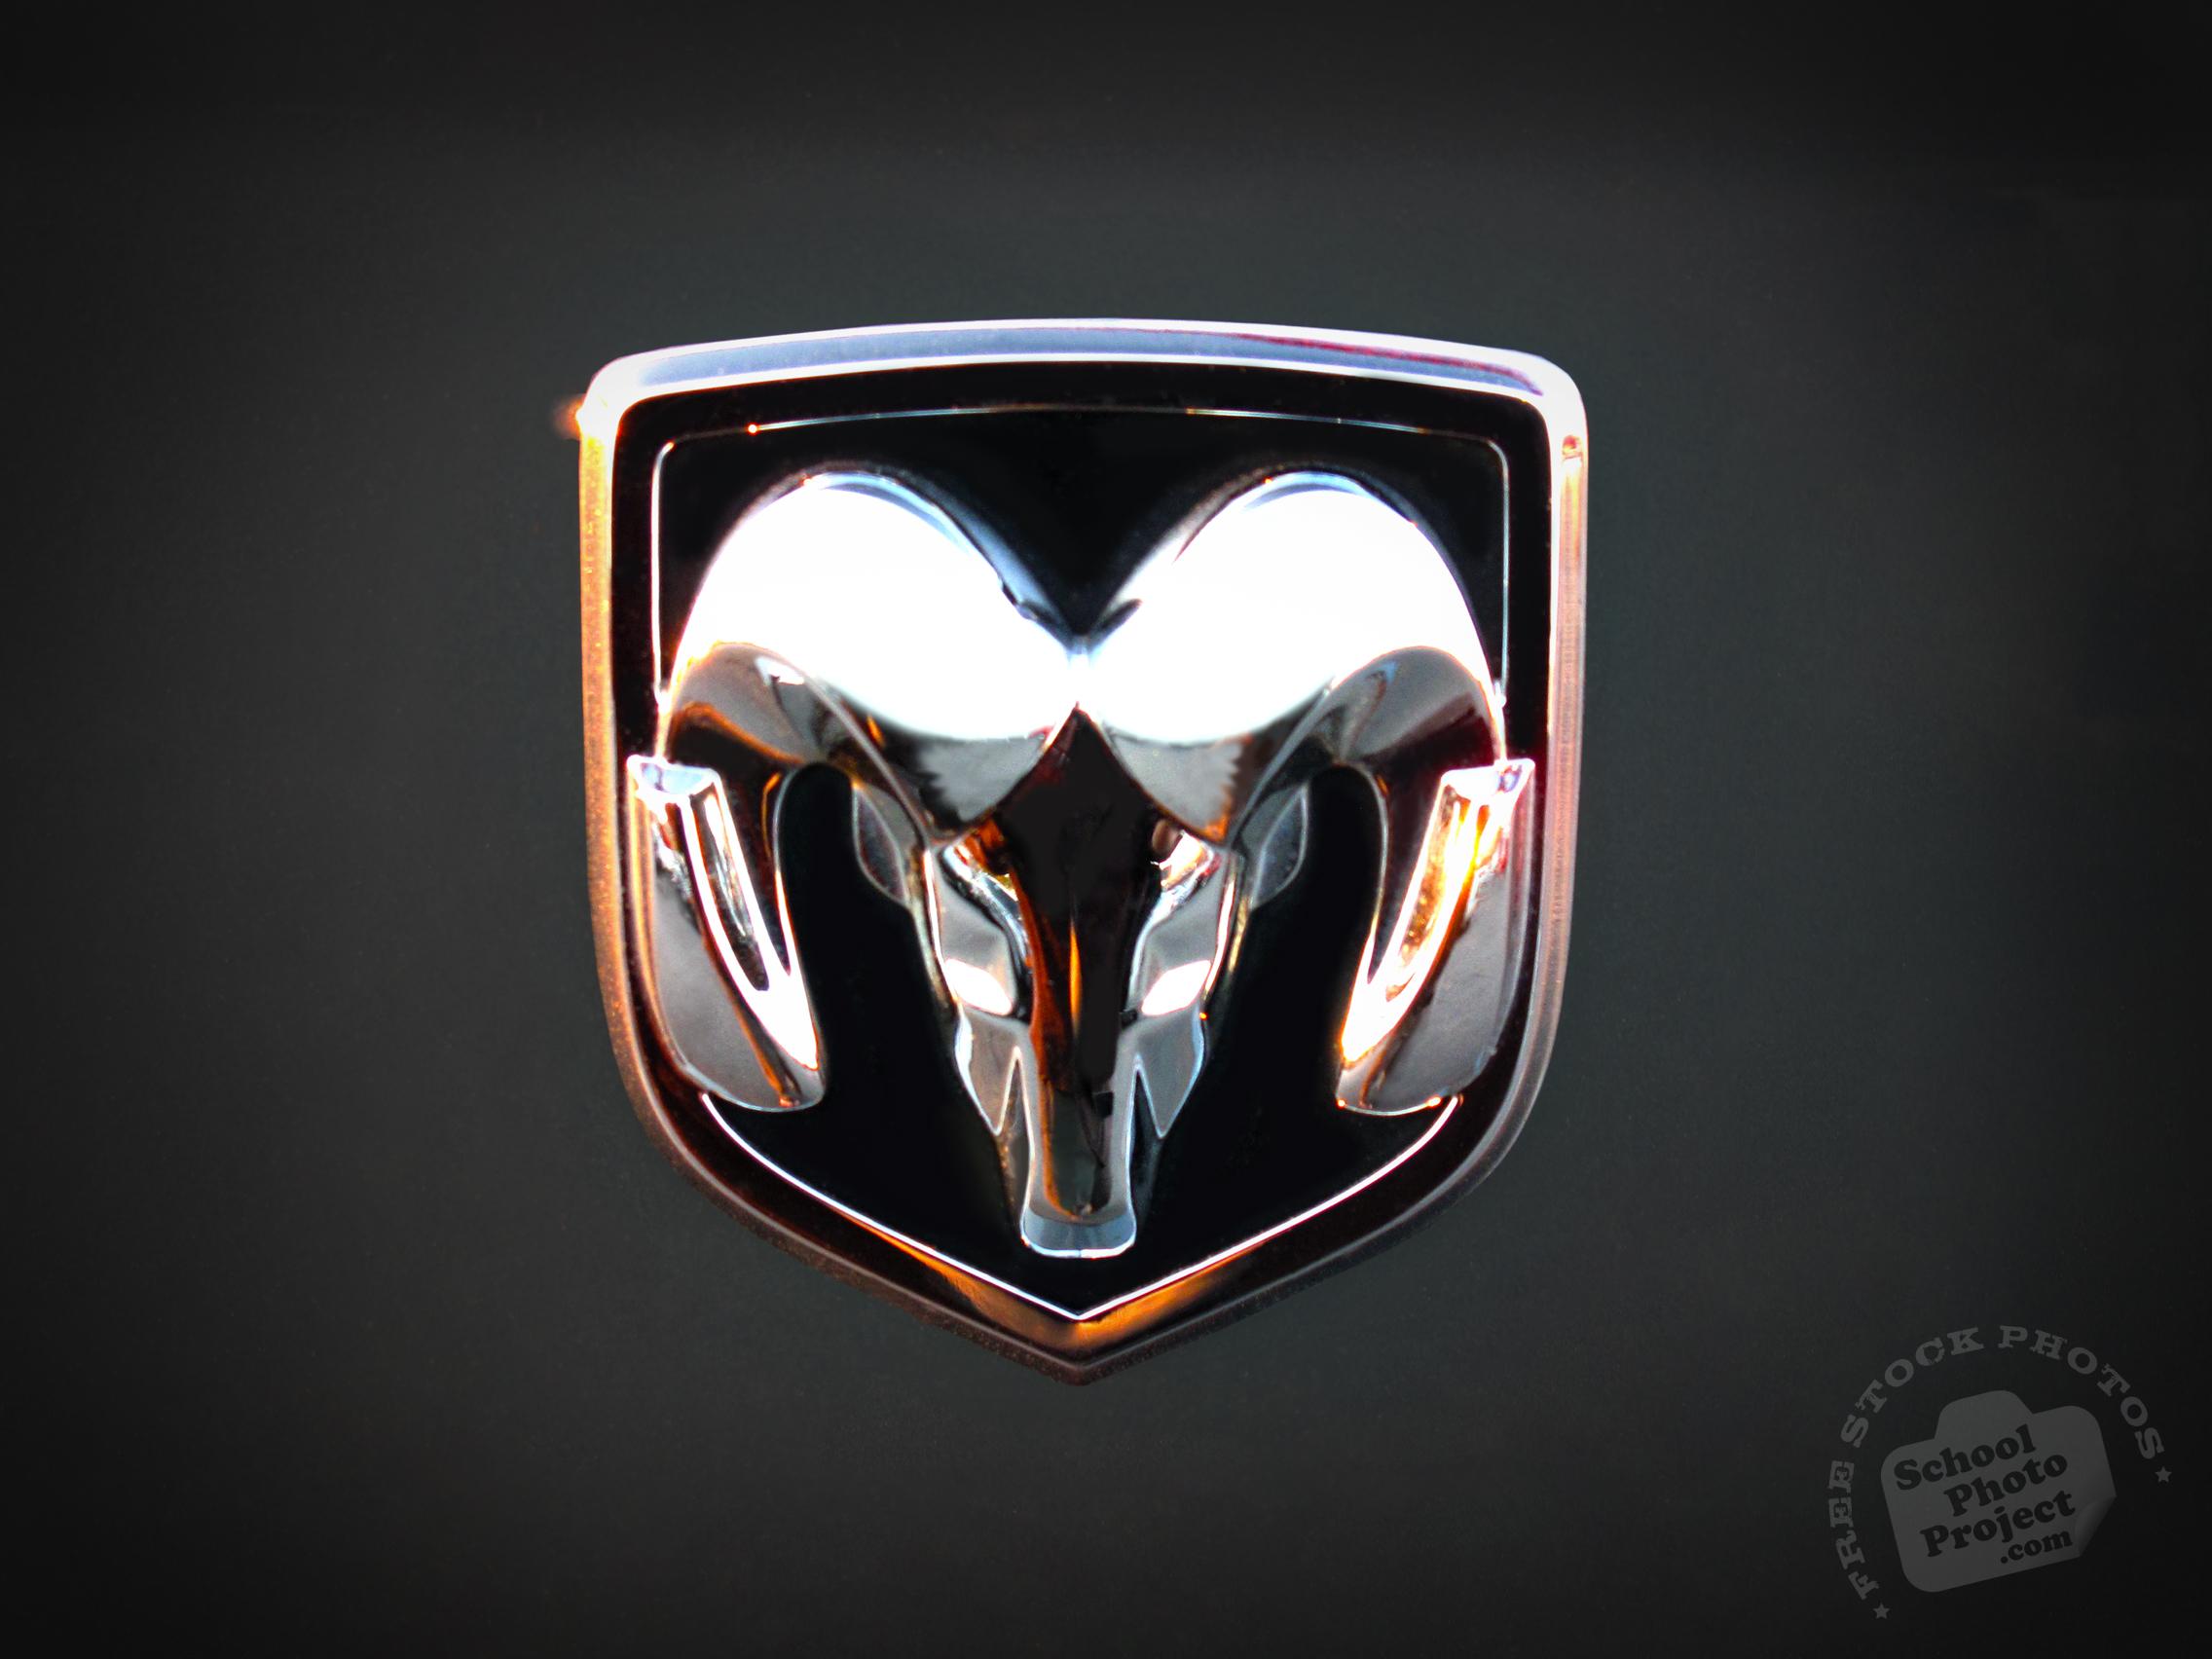 Download Wallpaper Logo Dodge Ram - dodge-ram-logo-photo1-l  Collection_111957.jpg